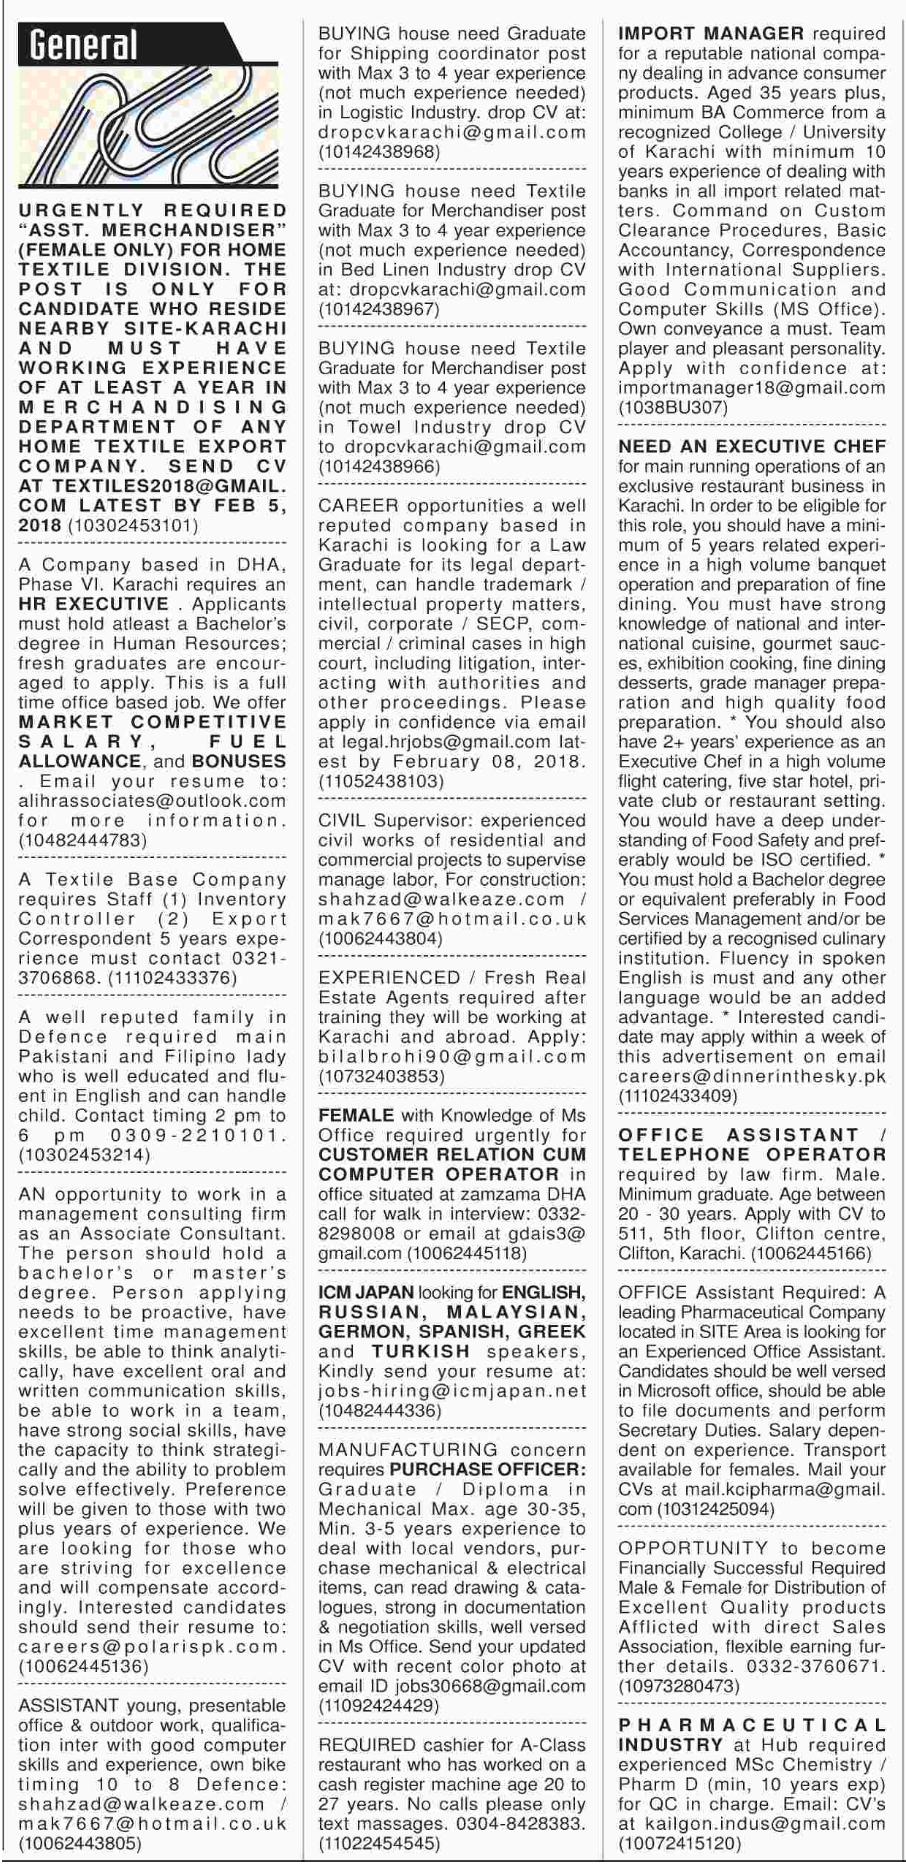 General Staff Required For Karachi Sindh 2018